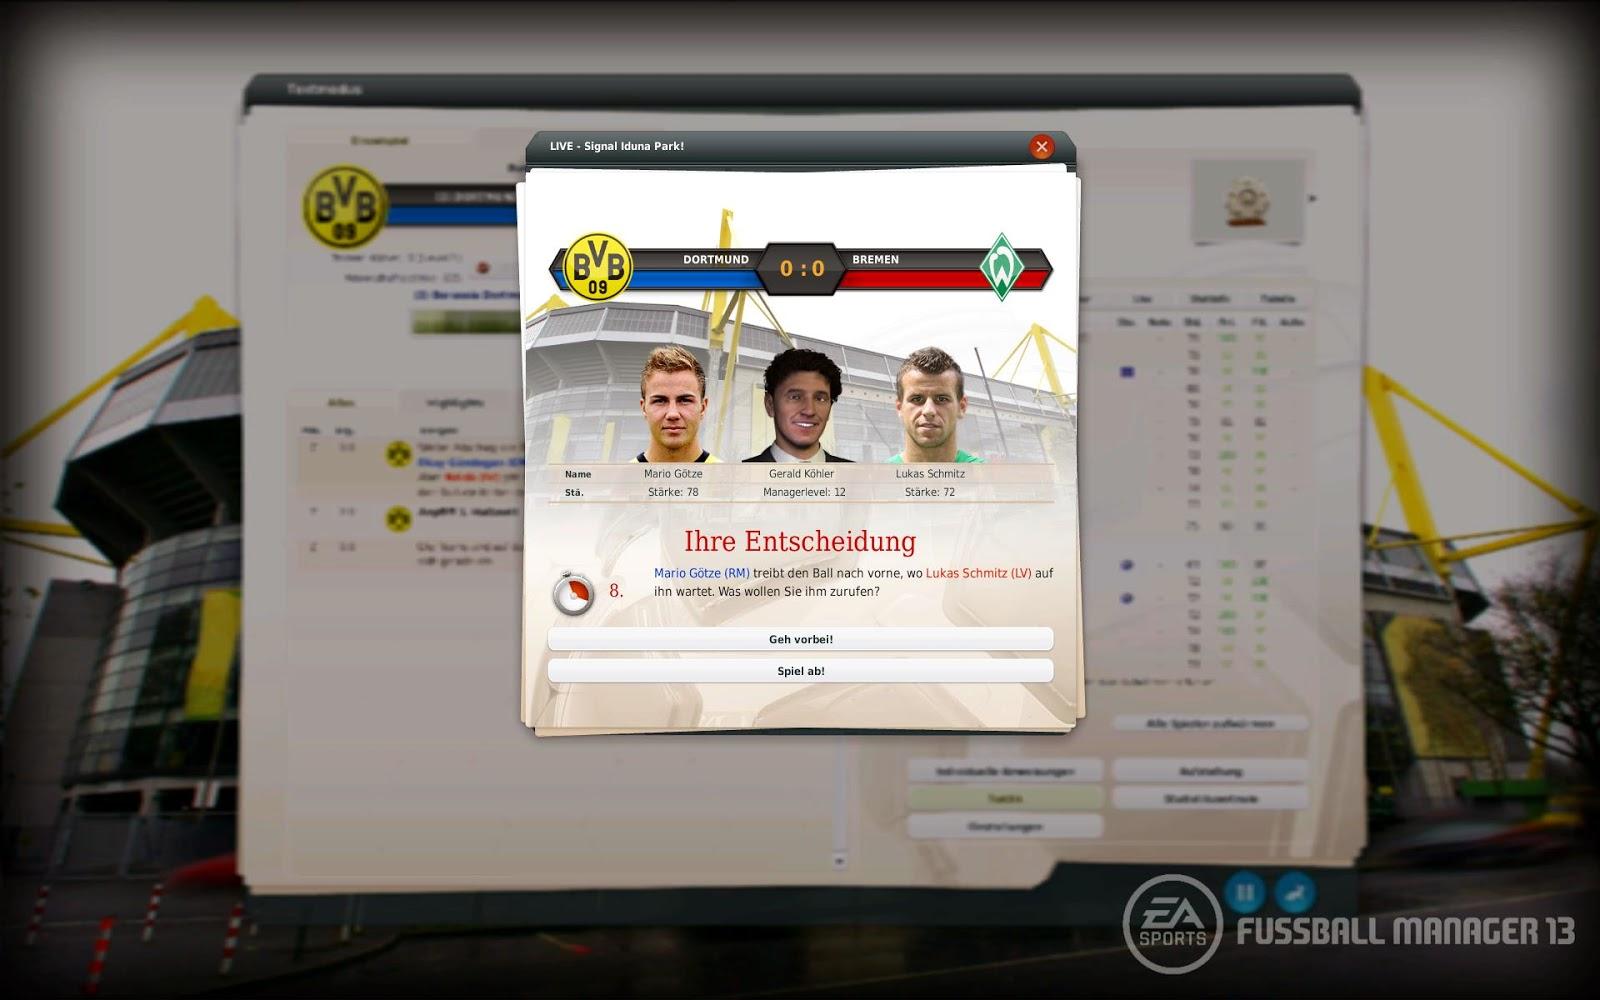 Fussball manager 13 download crack